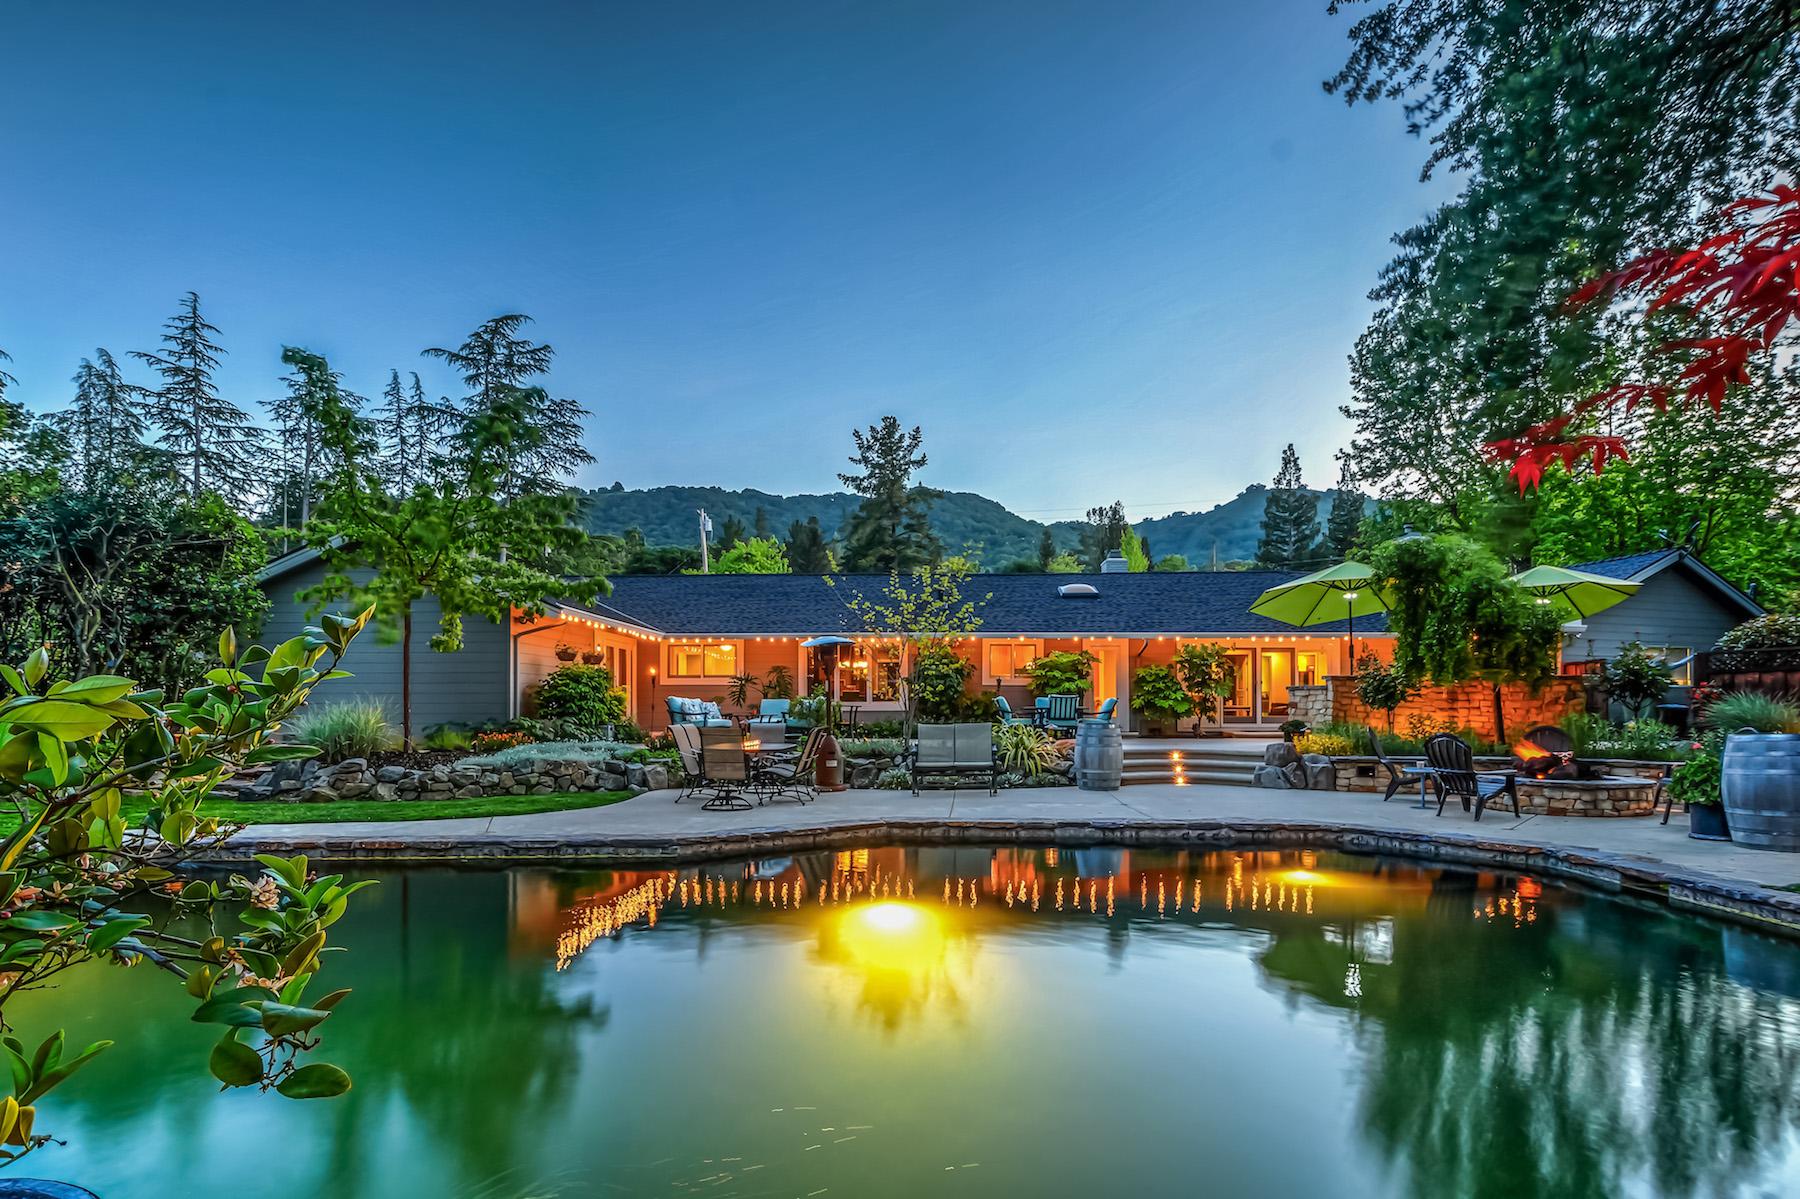 Moradia para Venda às 103 Whispering Trees Lane, Danville Danville, Califórnia, 94526 Estados Unidos